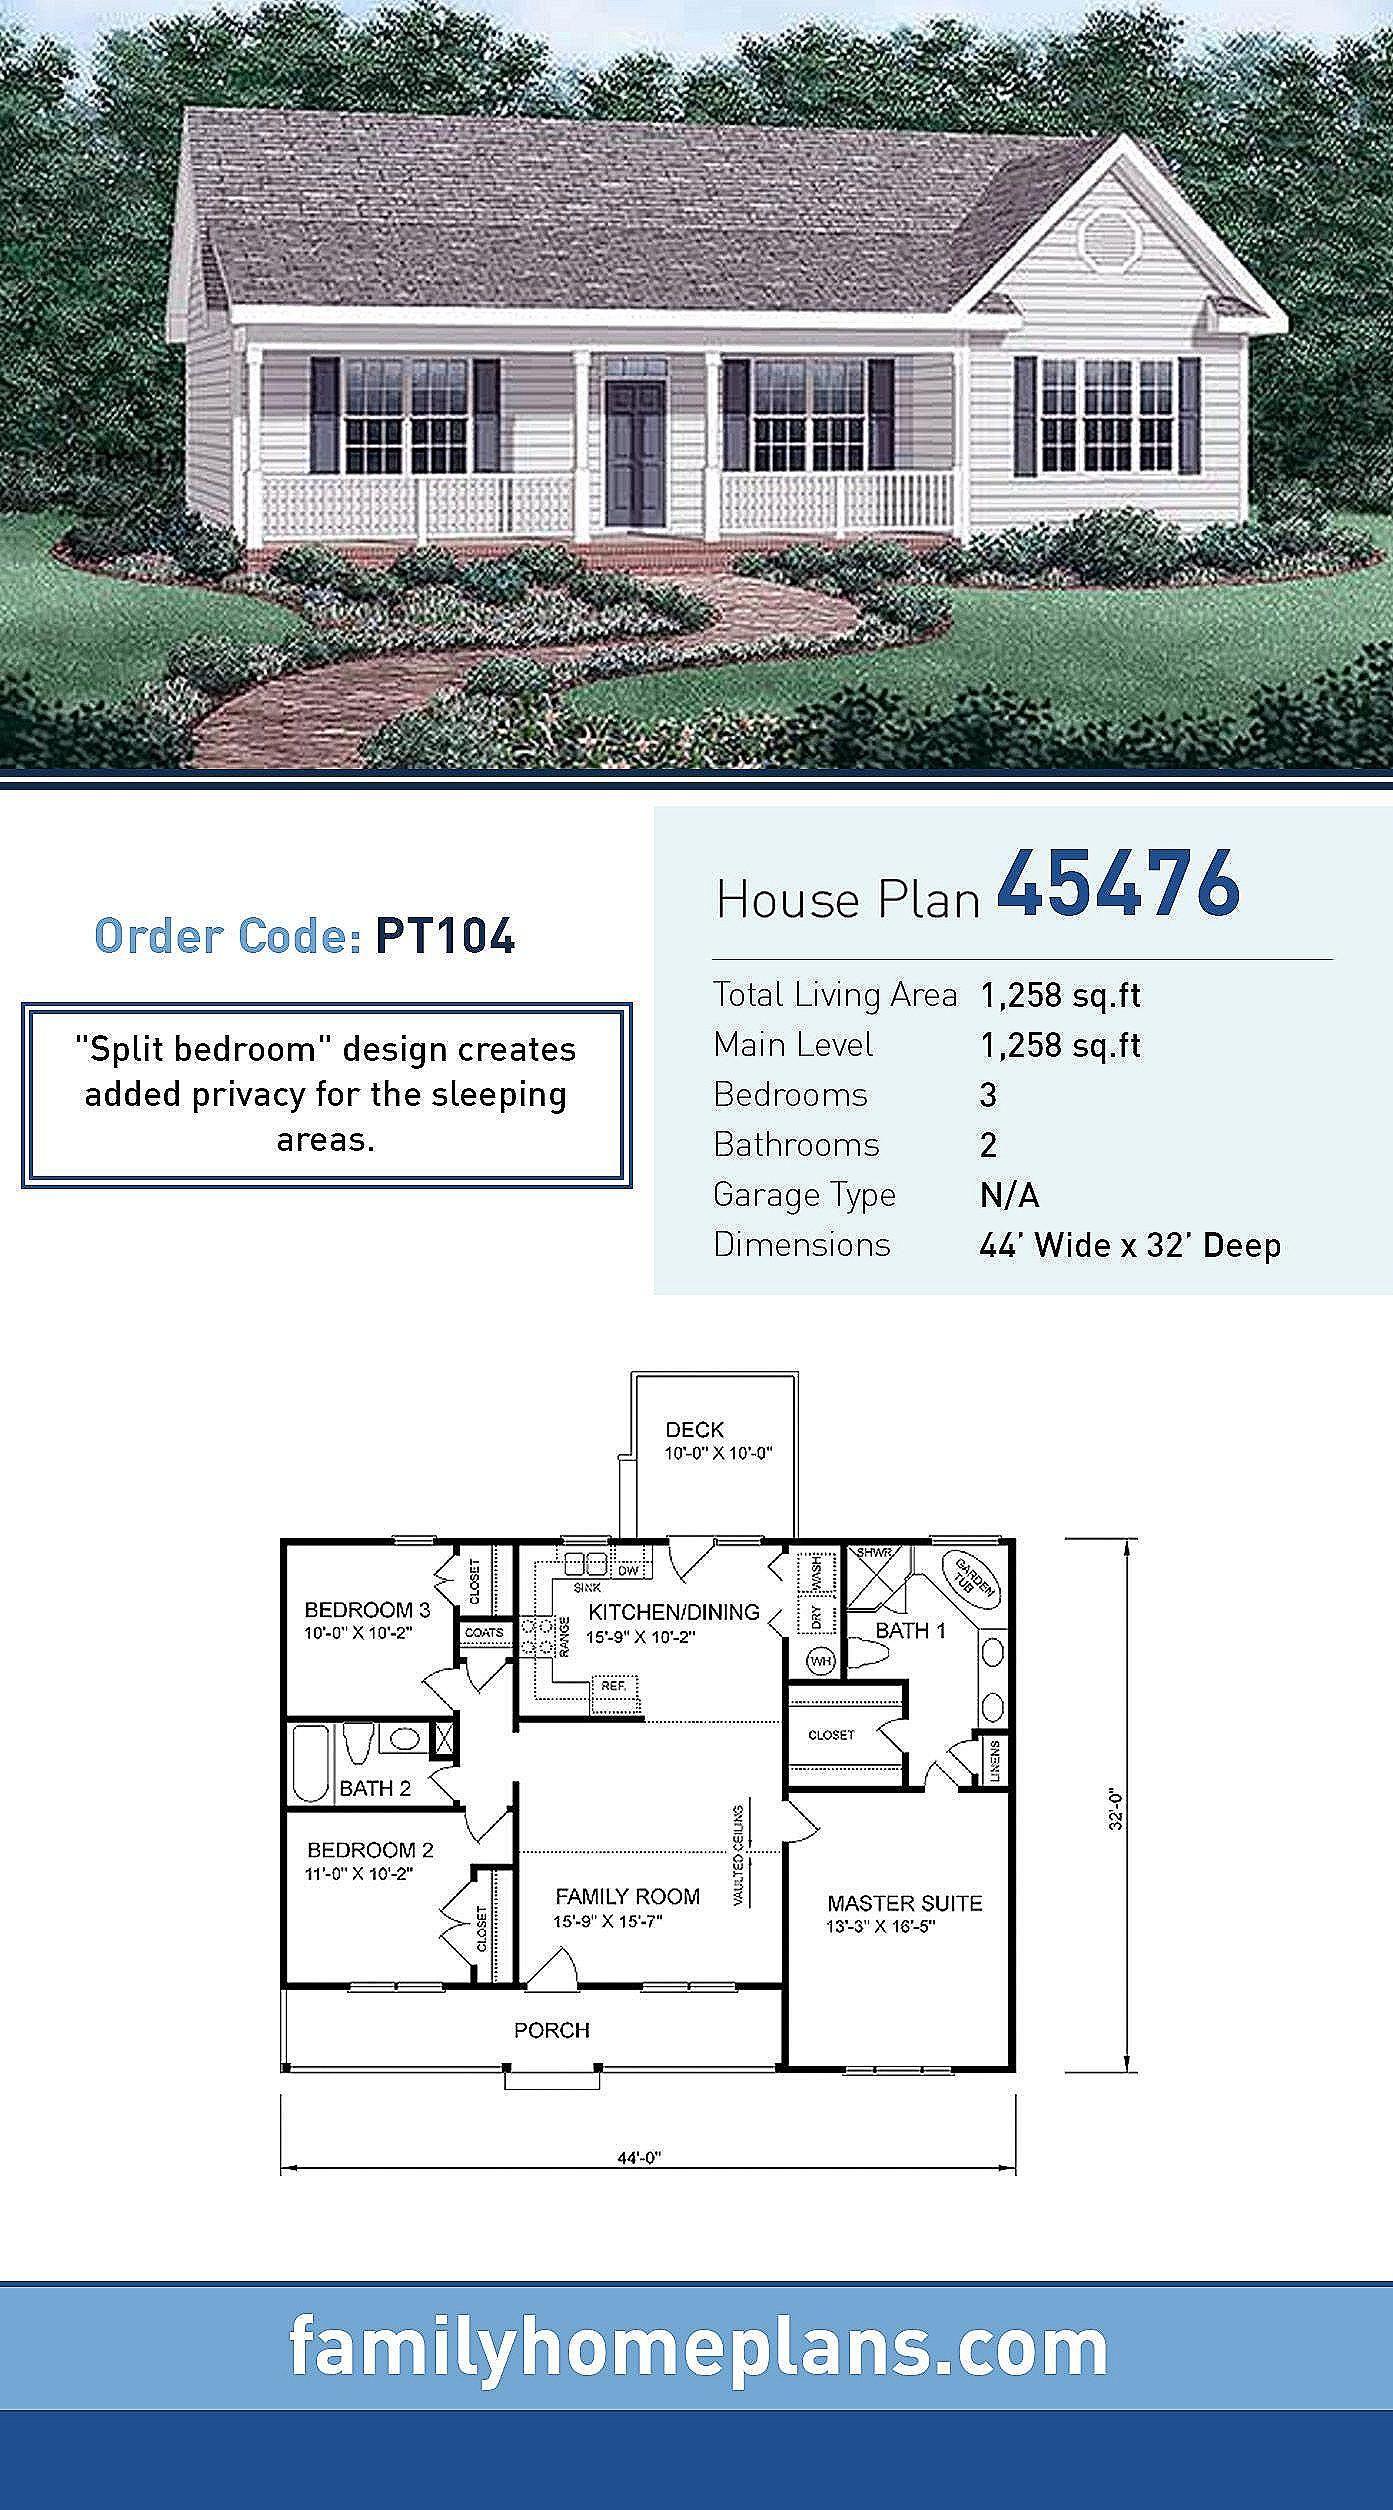 Elegant Bathroom Floor Plan Design House Blueprints Country Style House Plans Ranch House Plans